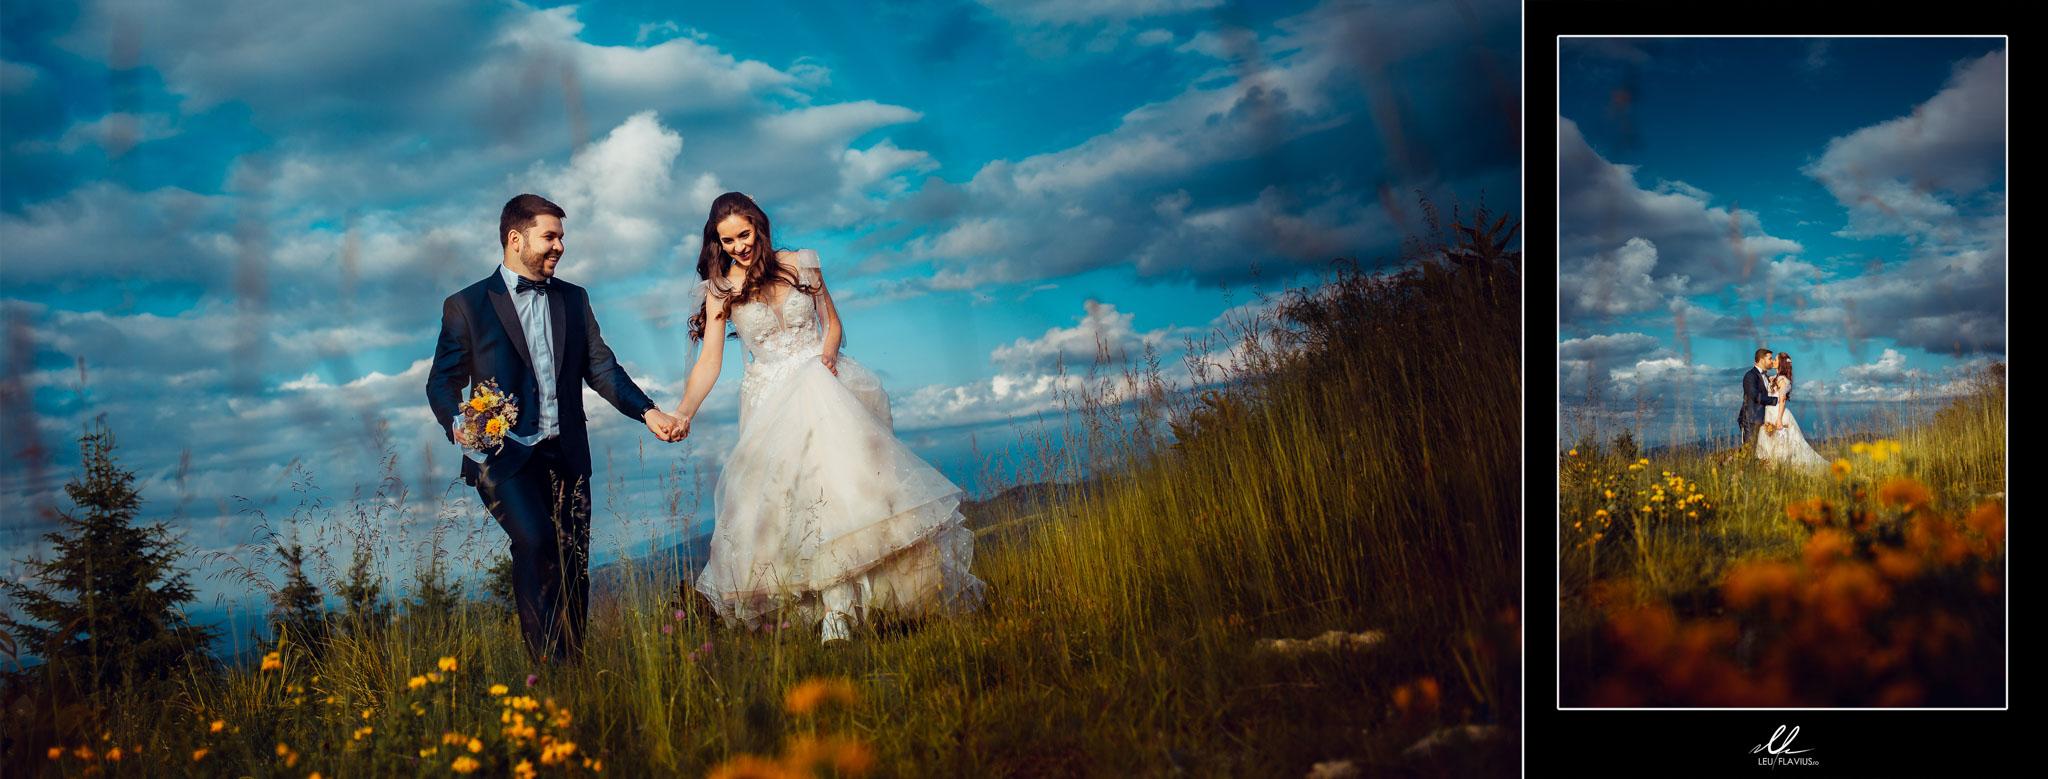 Colaj 03 - Trash the Dress - Cosmina si Ionut